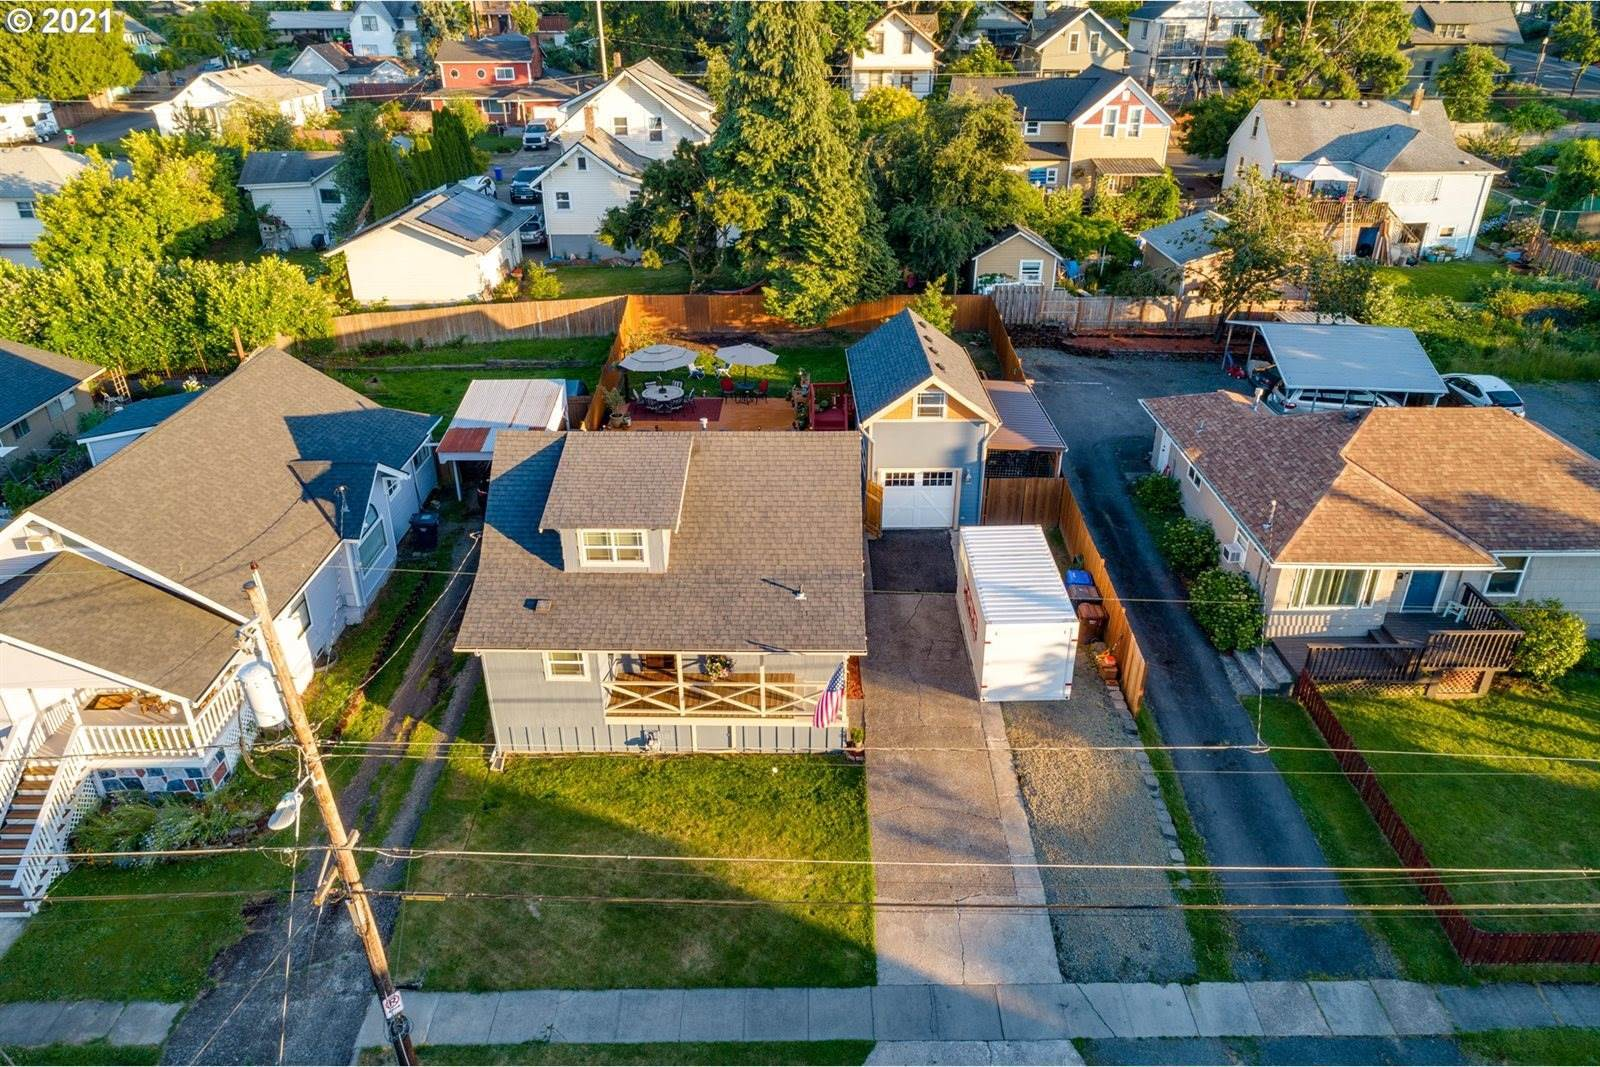 422 Willamette St, Oregon City, OR 97045